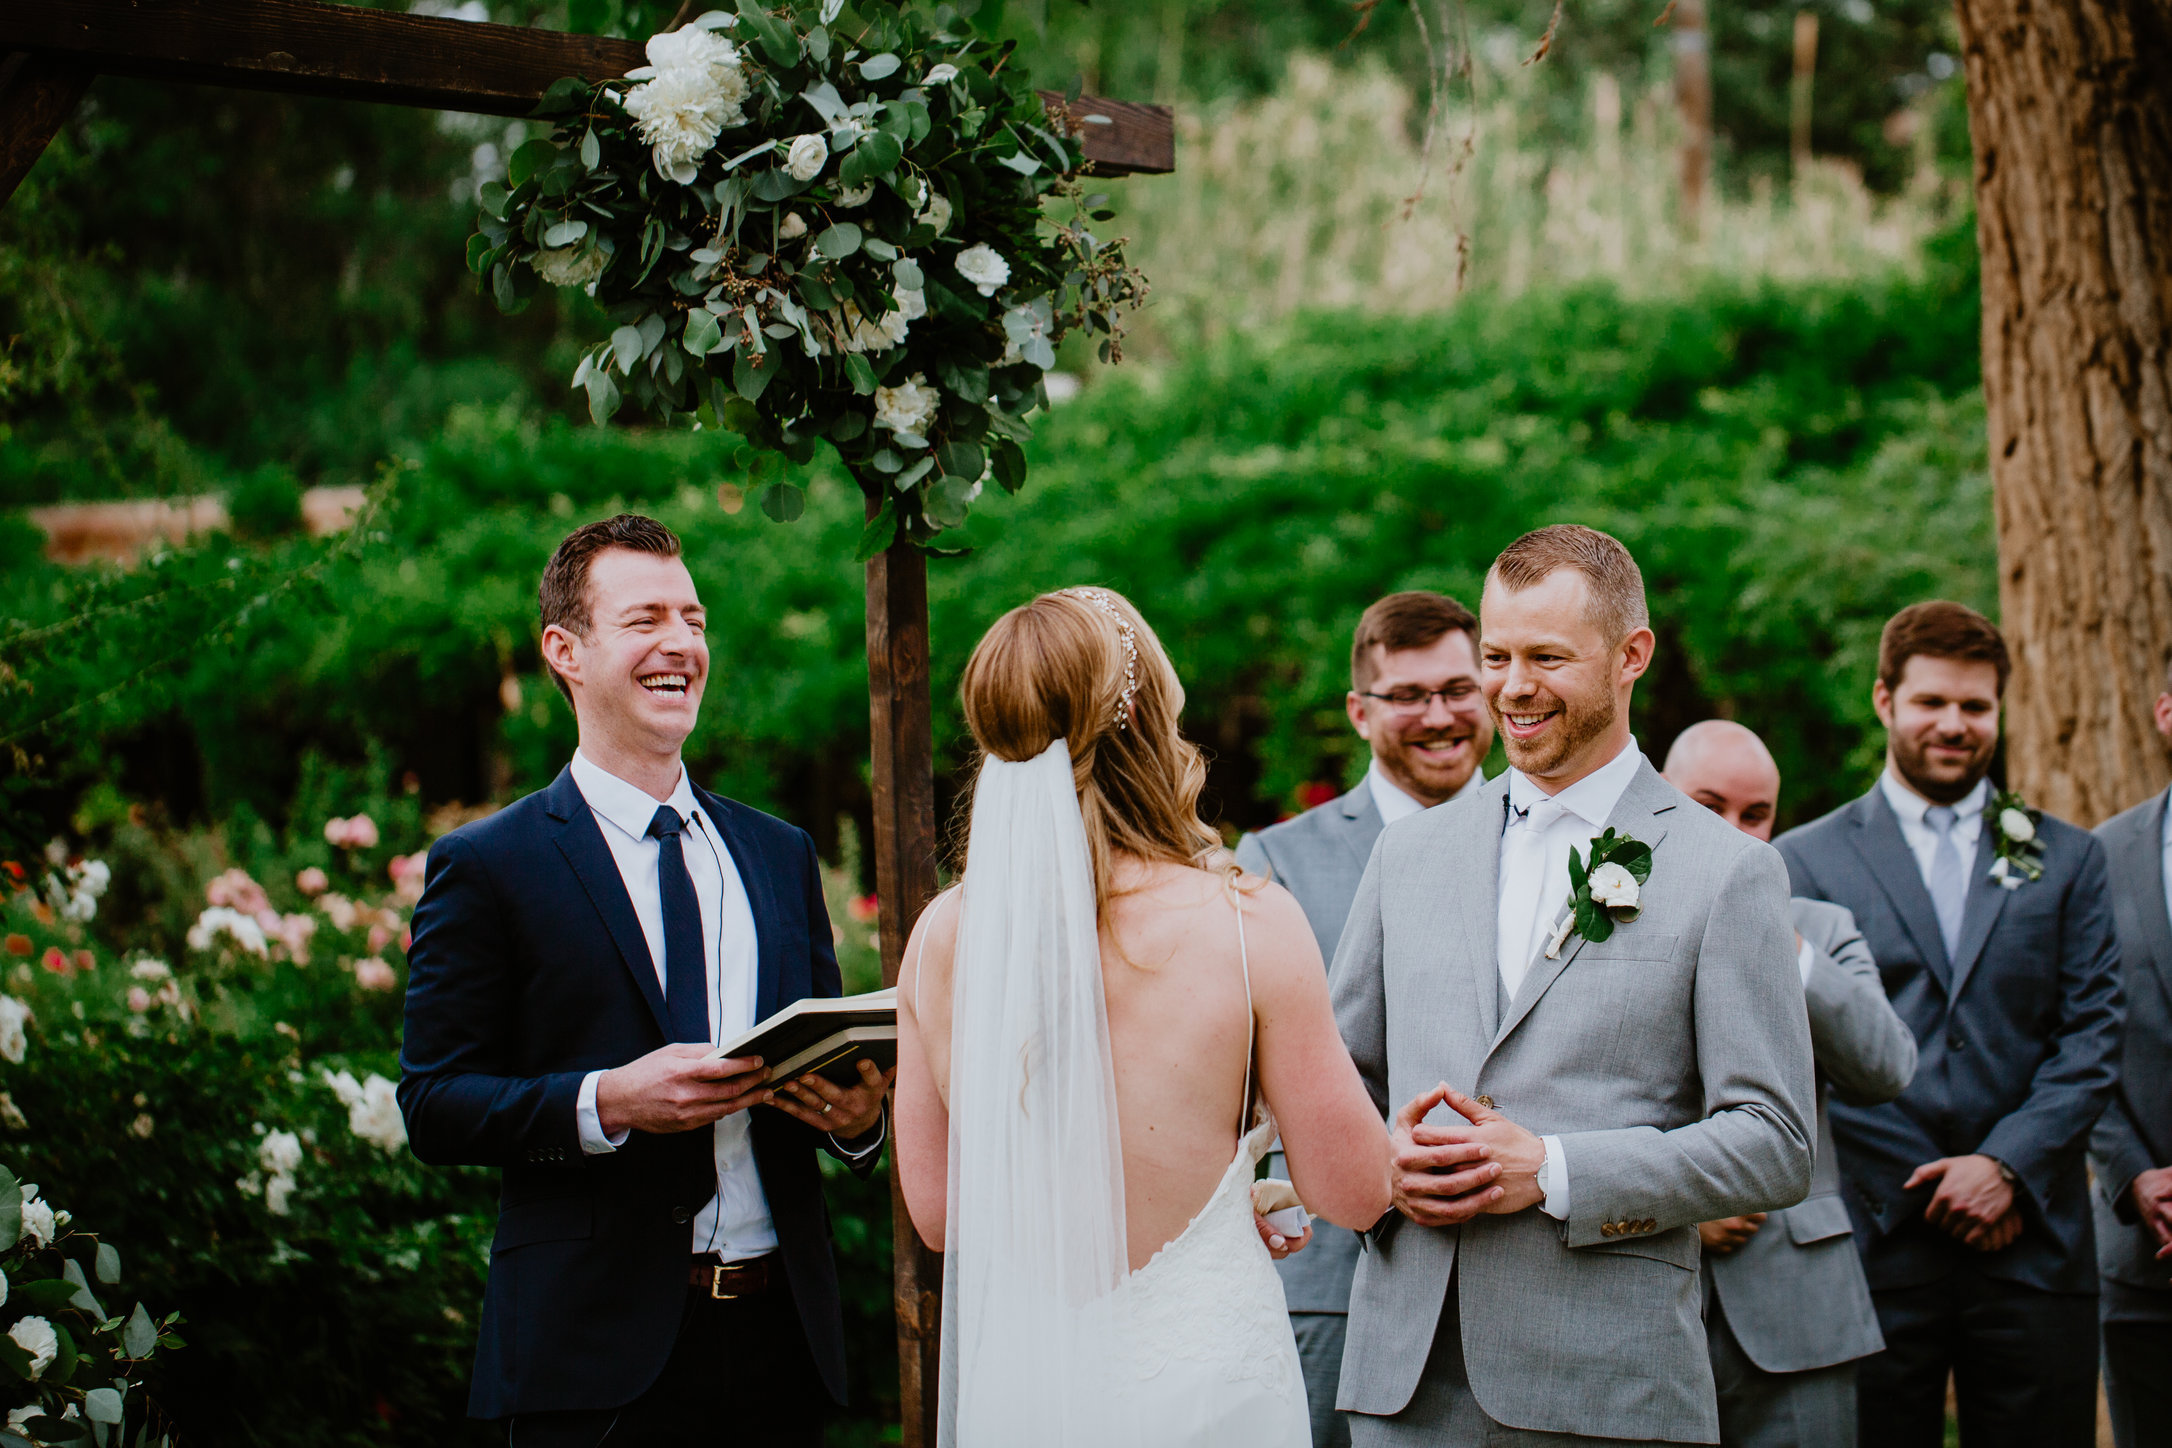 DandA-wedding-289.jpg